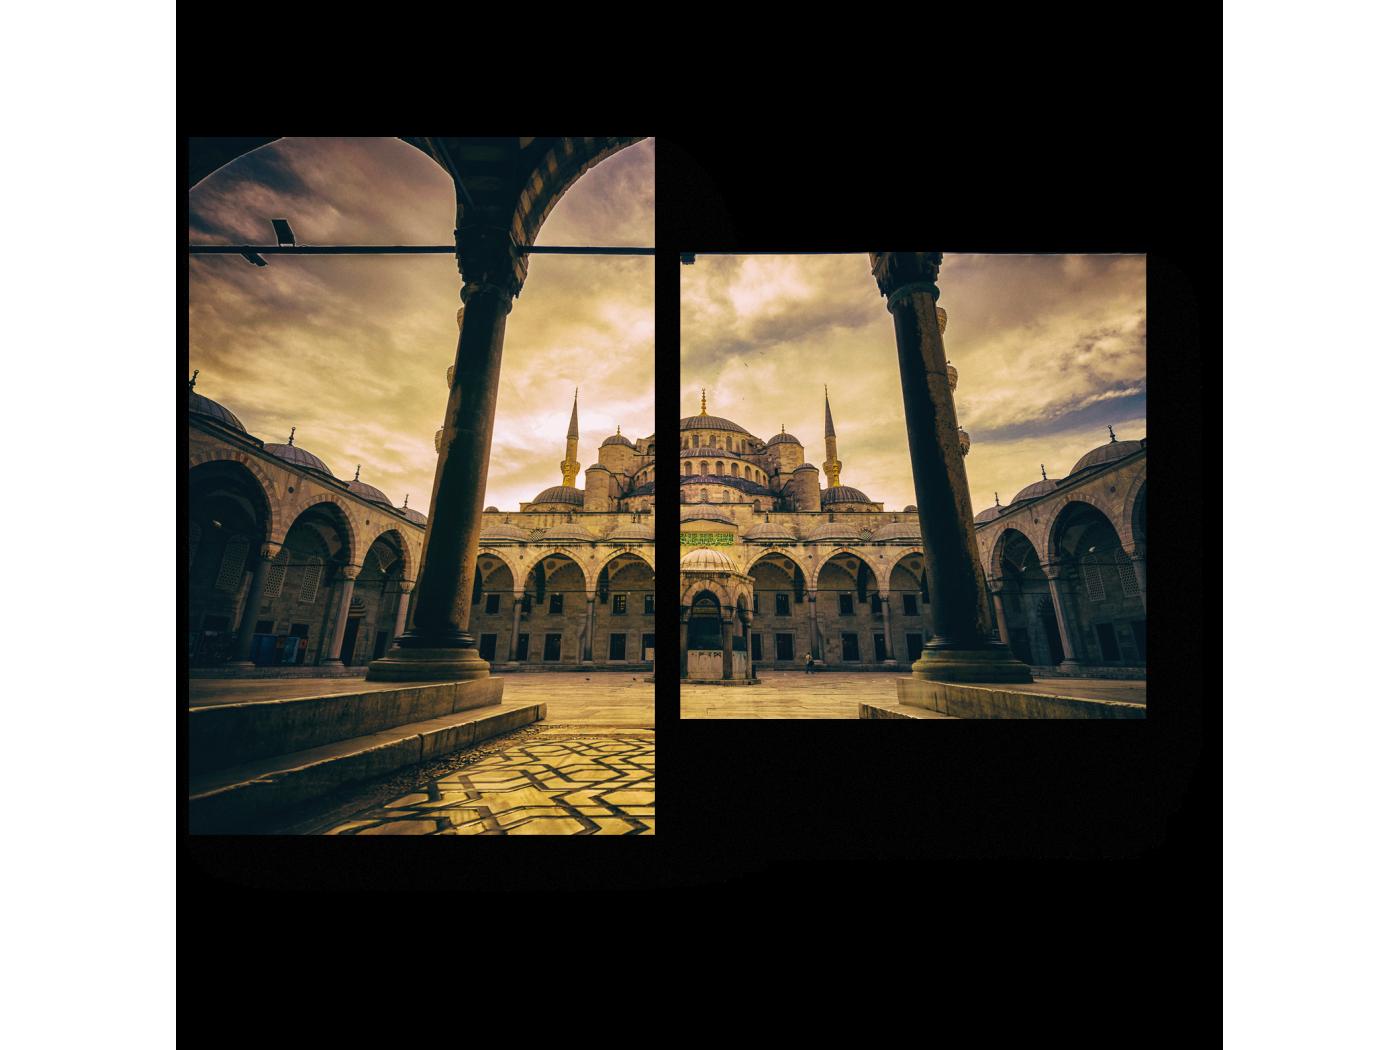 Модульная картина Мечеть в пасмурную погоду (40x30) фото